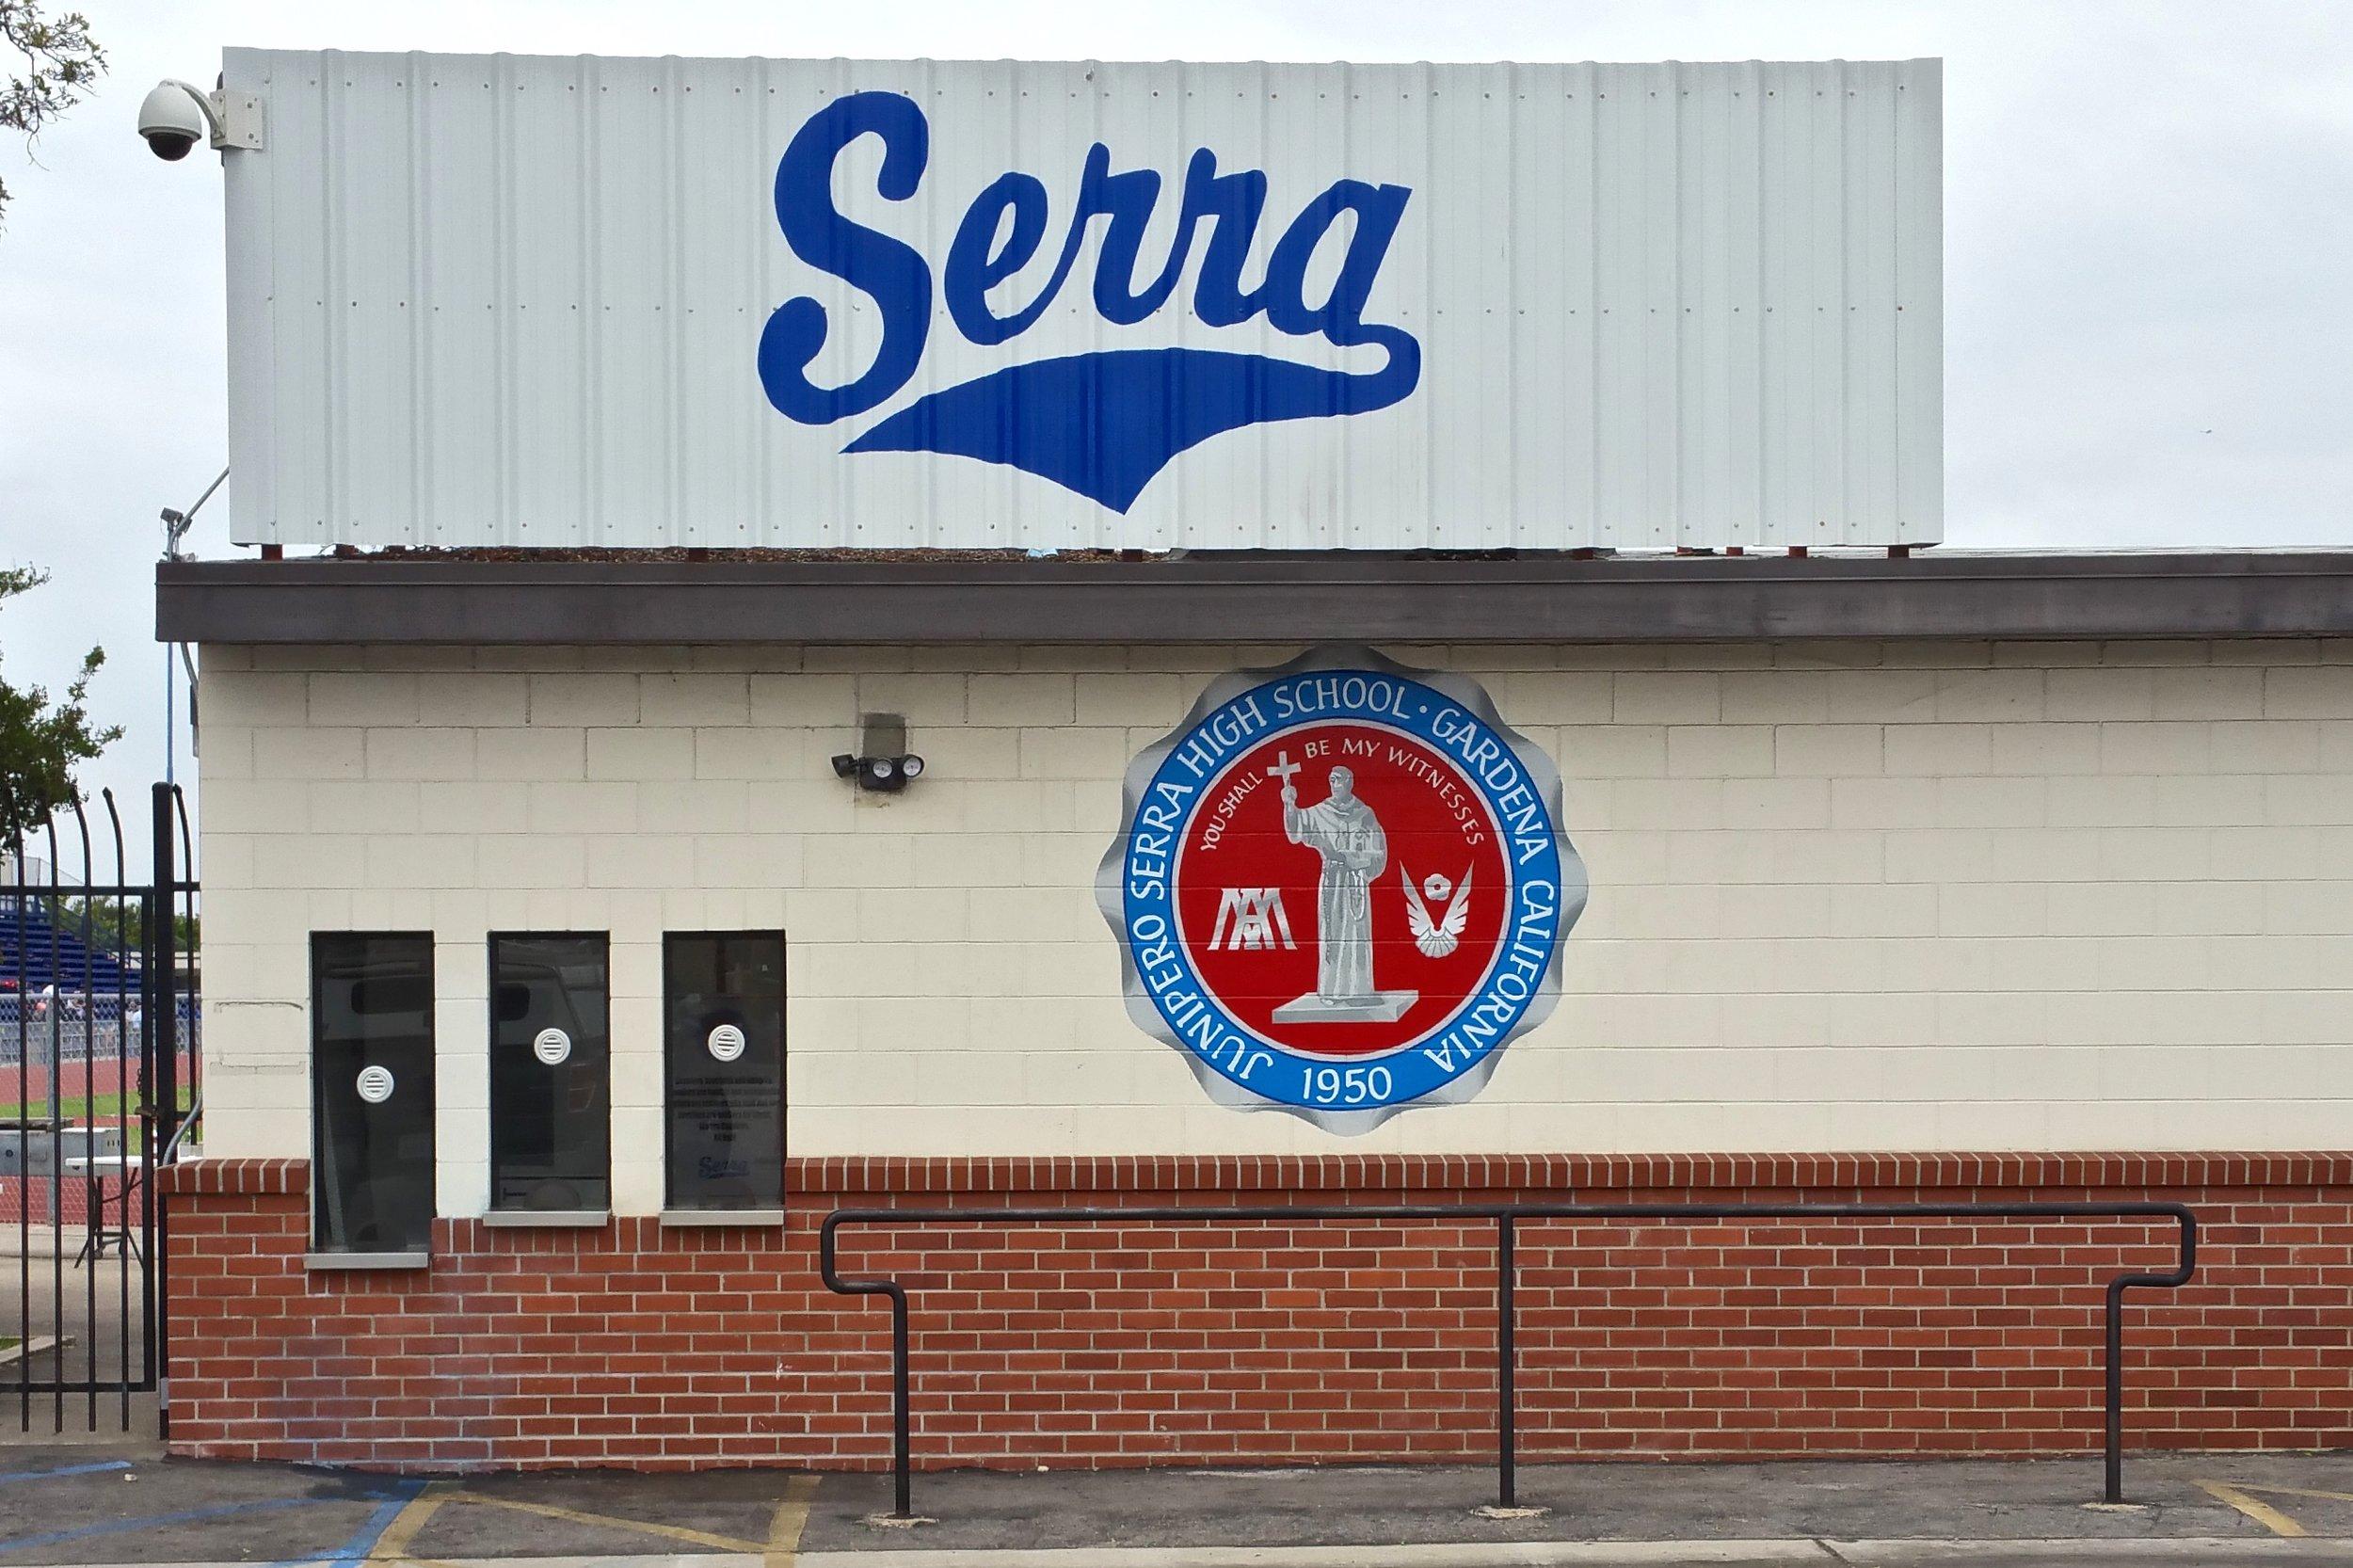 Serra High School hand painted graphics